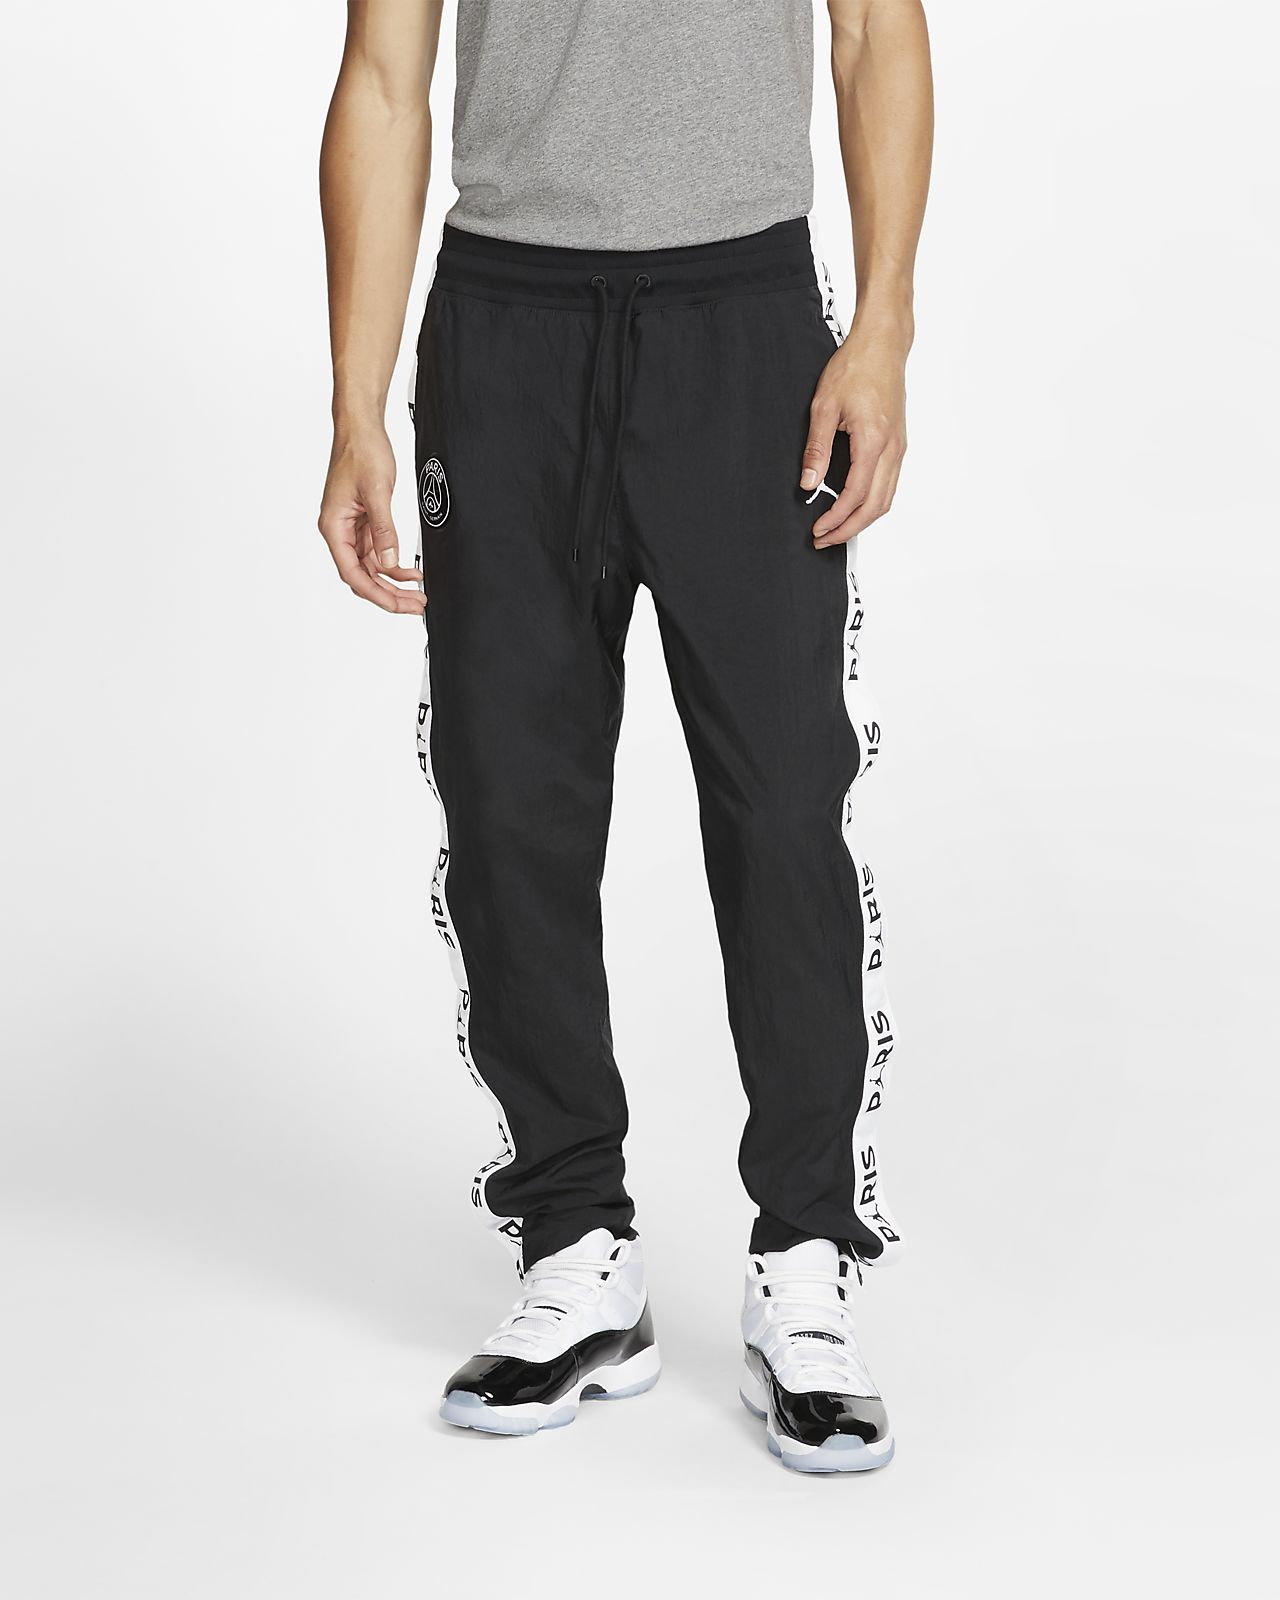 Pantalones para hombre Paris Saint-Germain